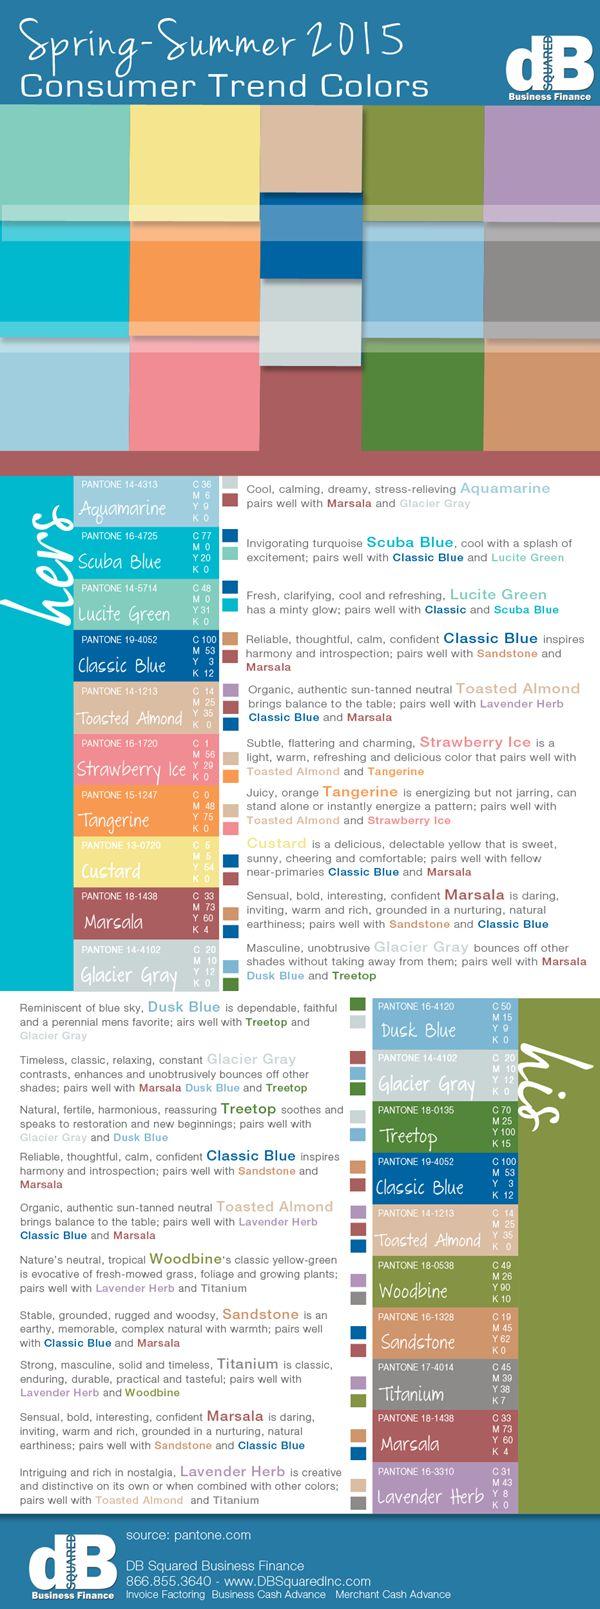 73 best images about color palettes on pinterest for Tropical paint colors